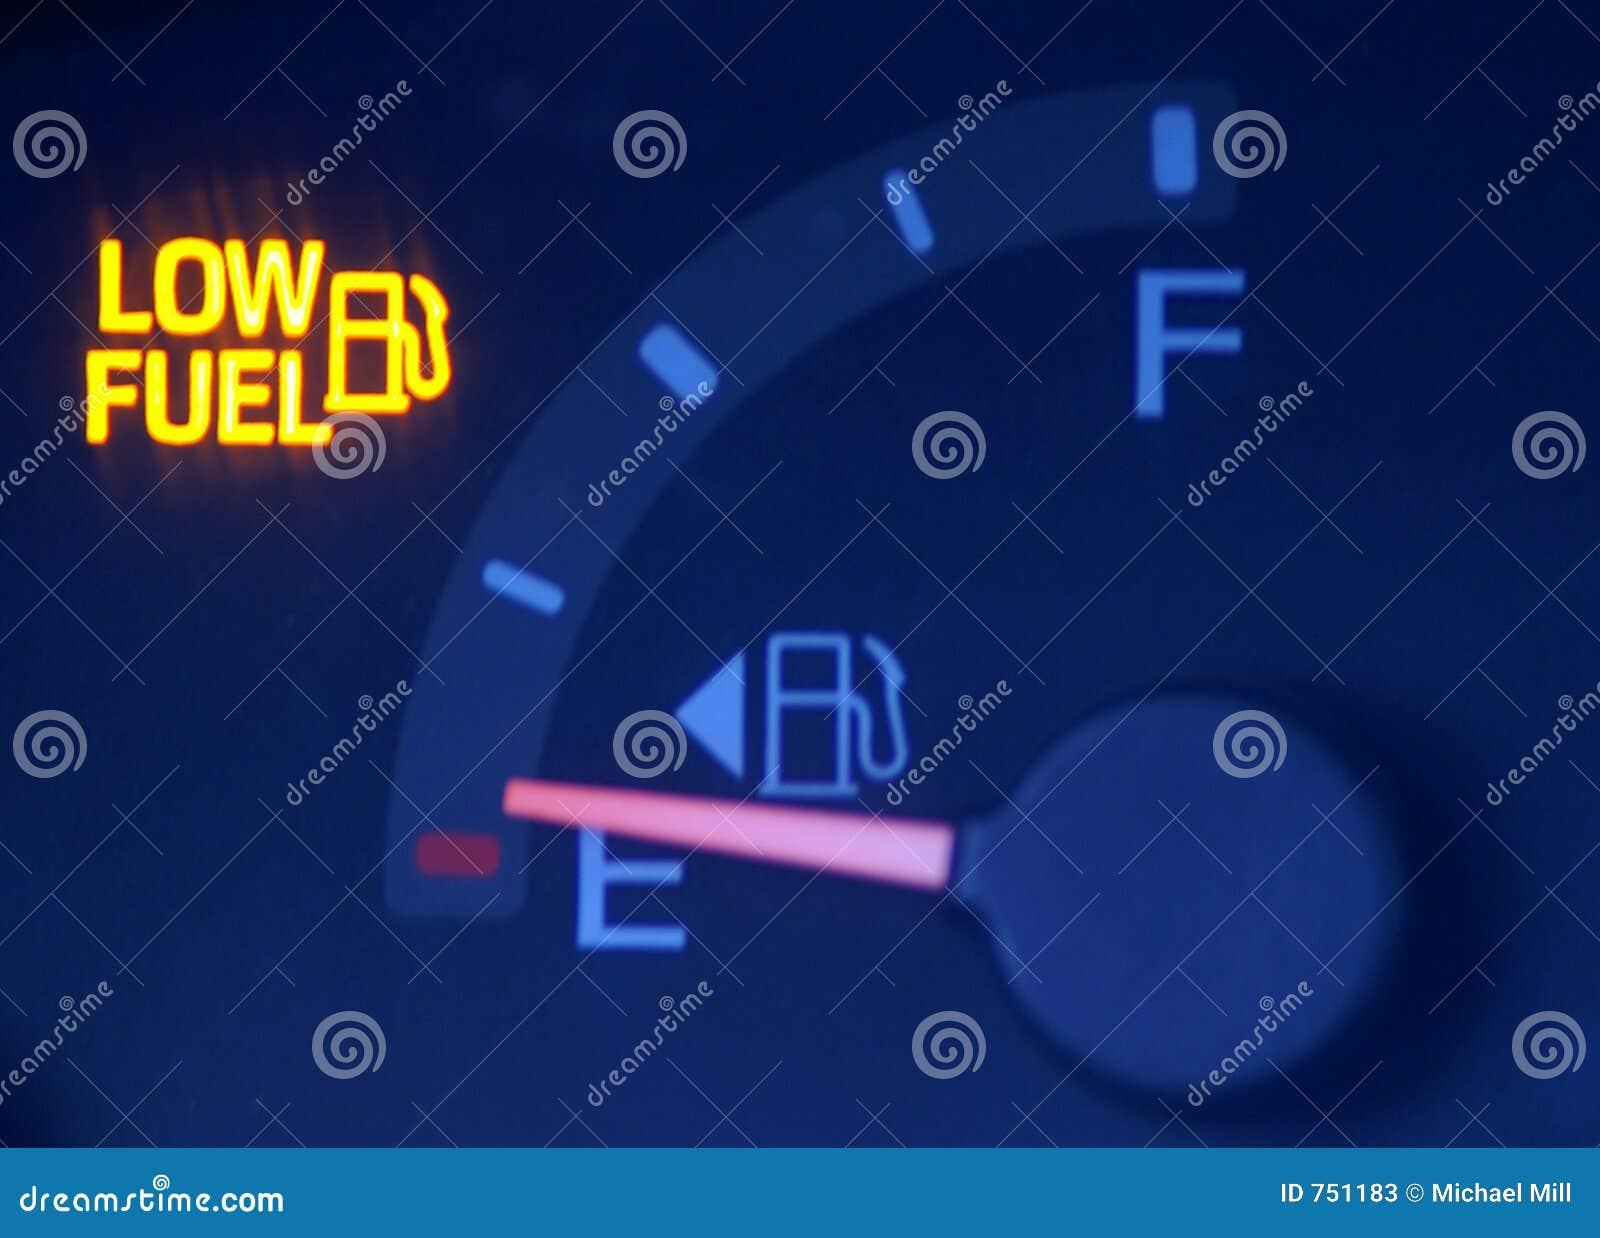 Low Fuel Stock Photos - Image: 751183